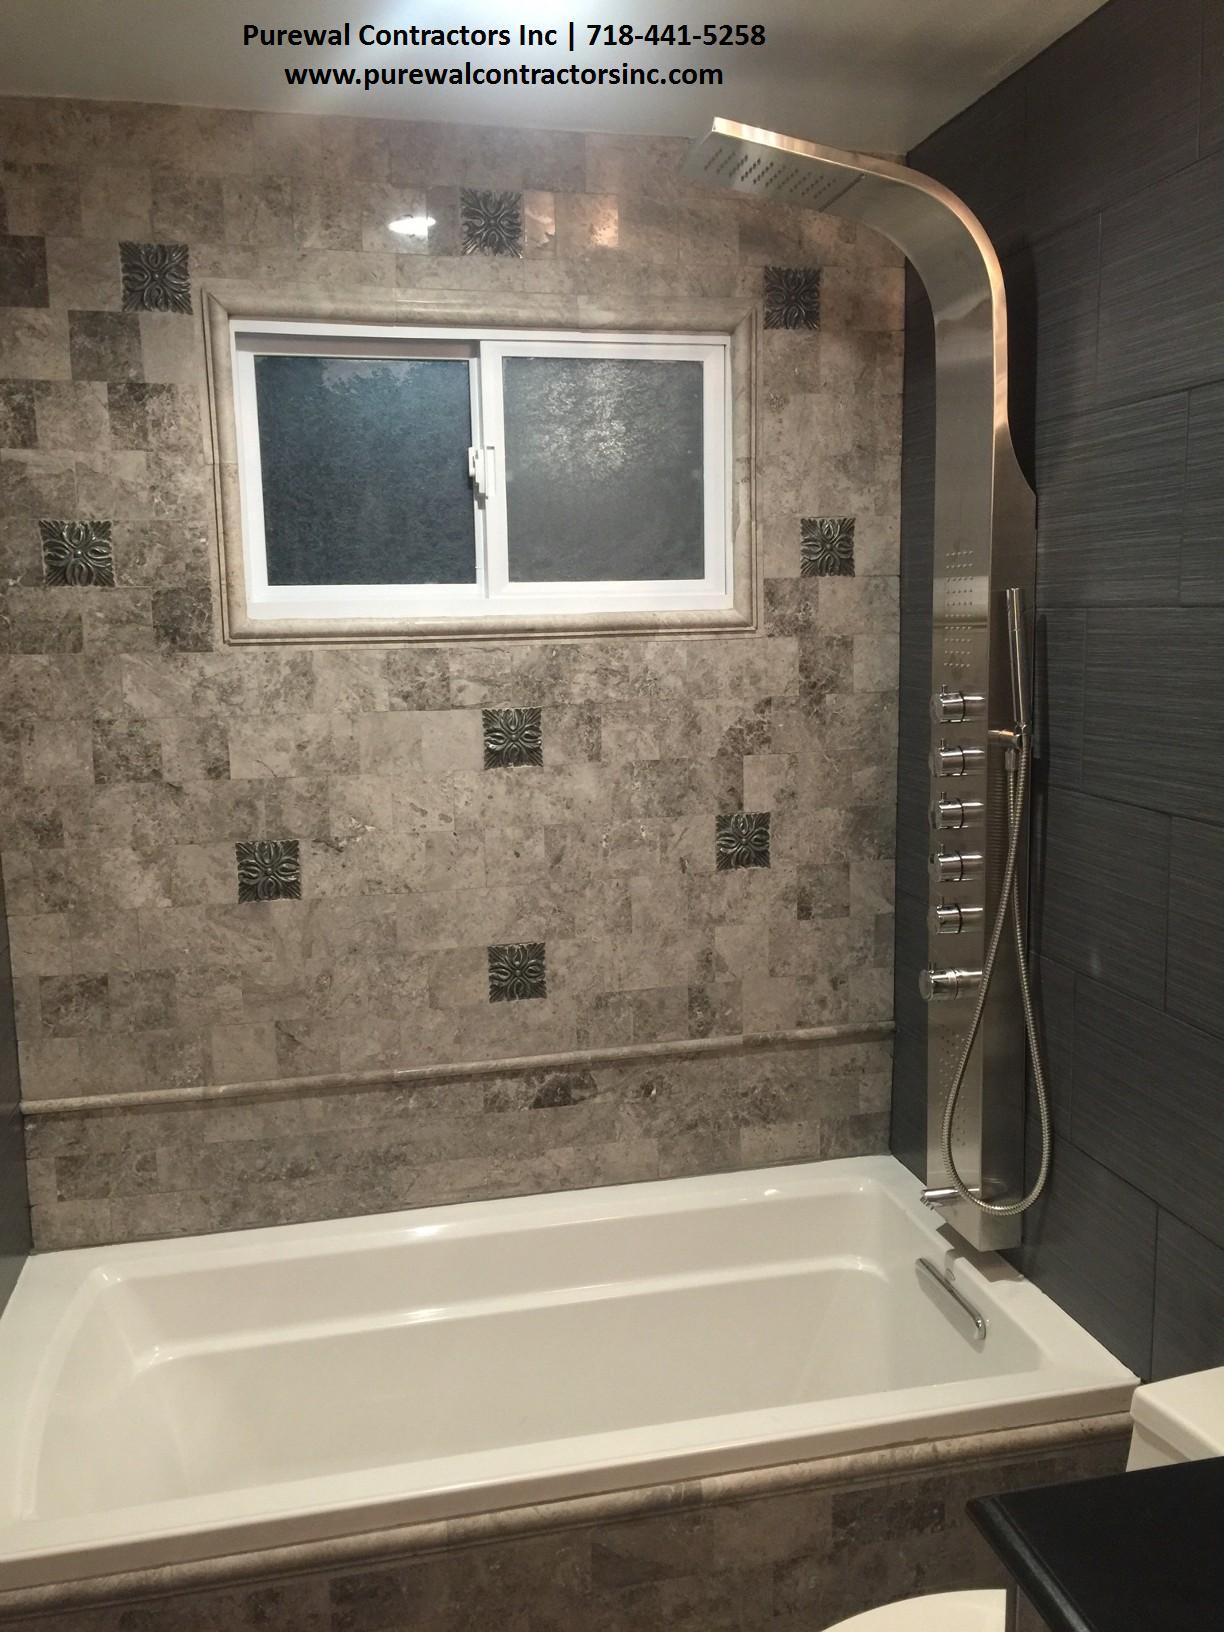 General Contractor Queens Brooklyn Purewal Contractors Inc - Bathroom contractors nyc